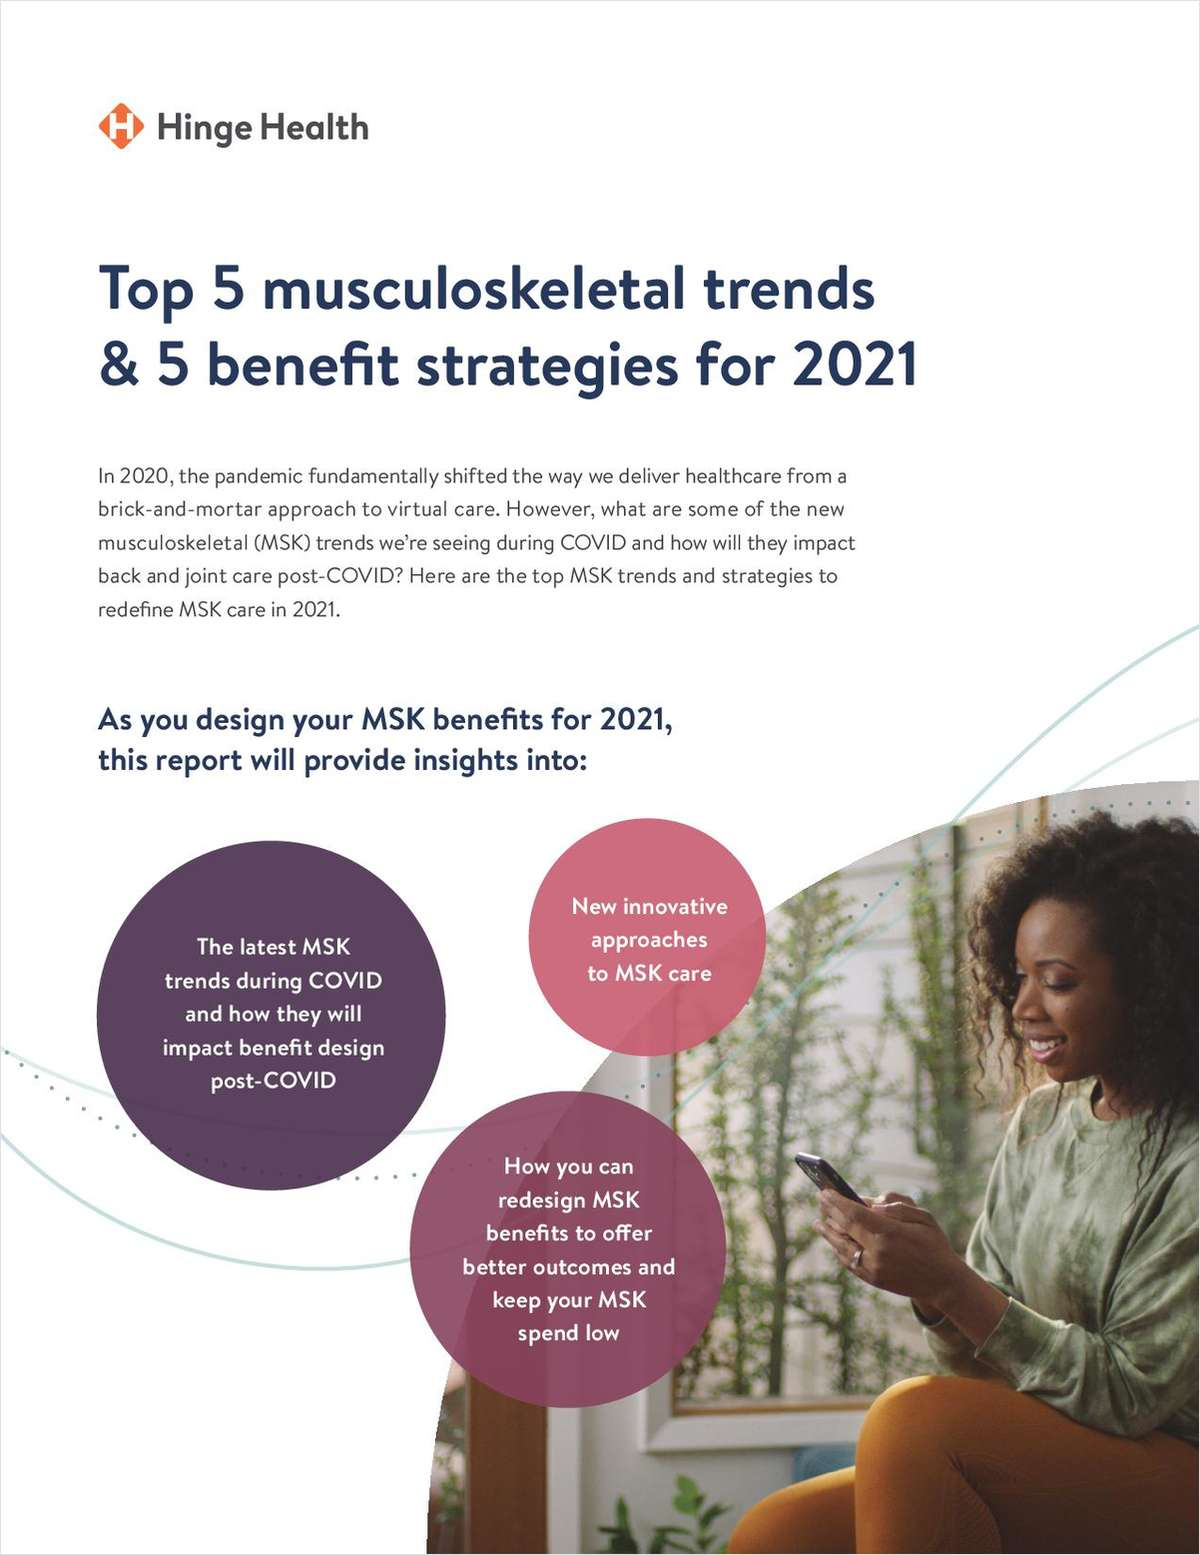 5 Musculoskeletal Trends & 5 Benefit Strategies for 2021